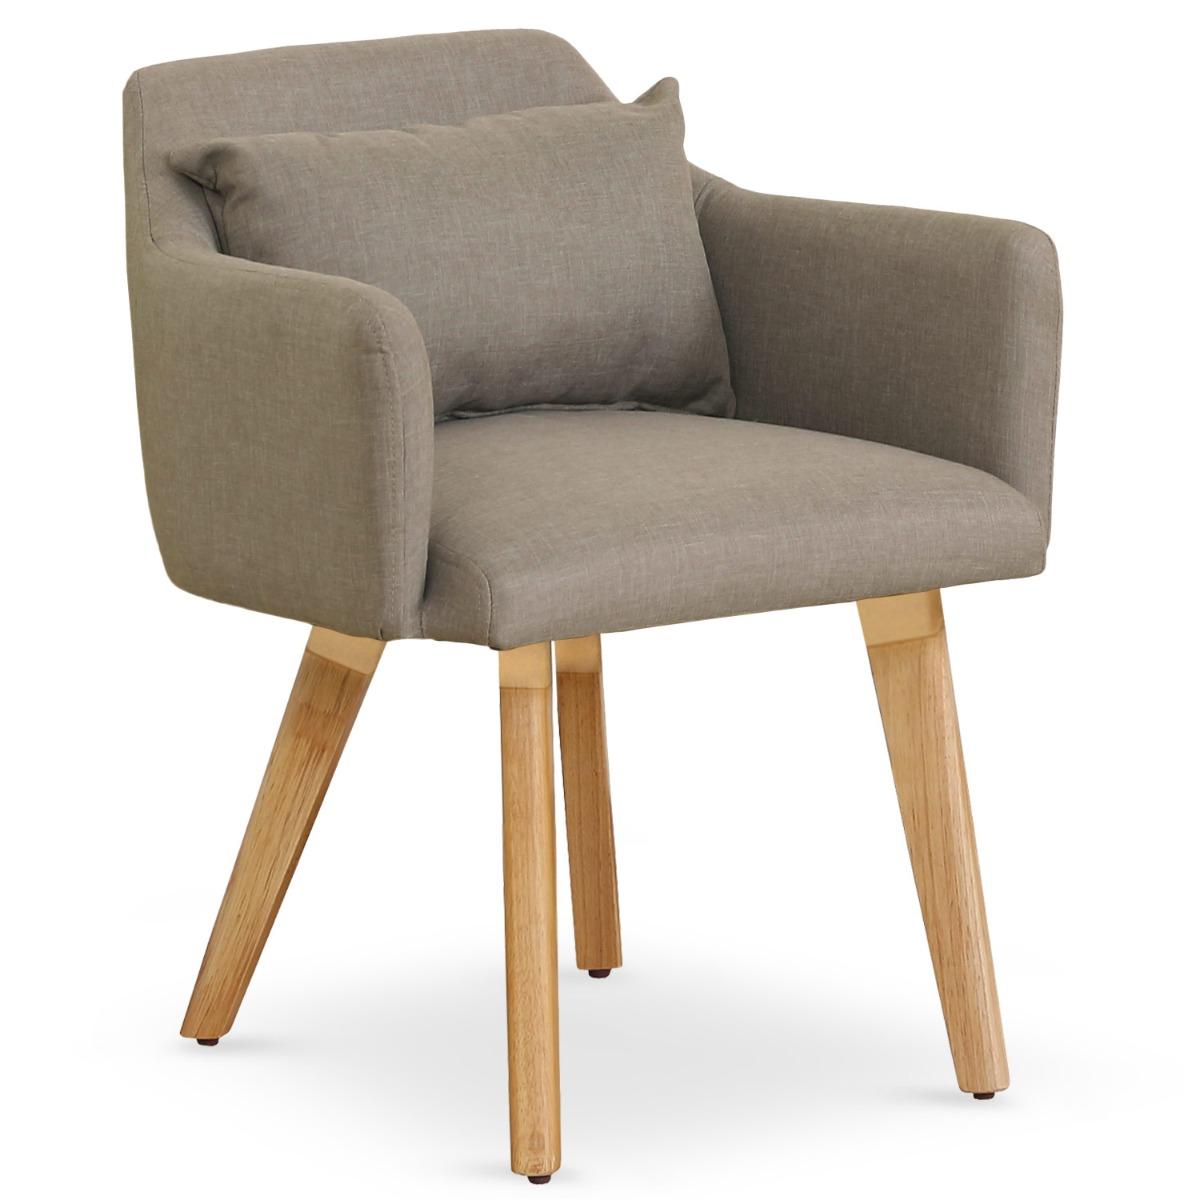 Lot de 20 chaises / fauteuils scandinaves Gybson Tissu Taupe